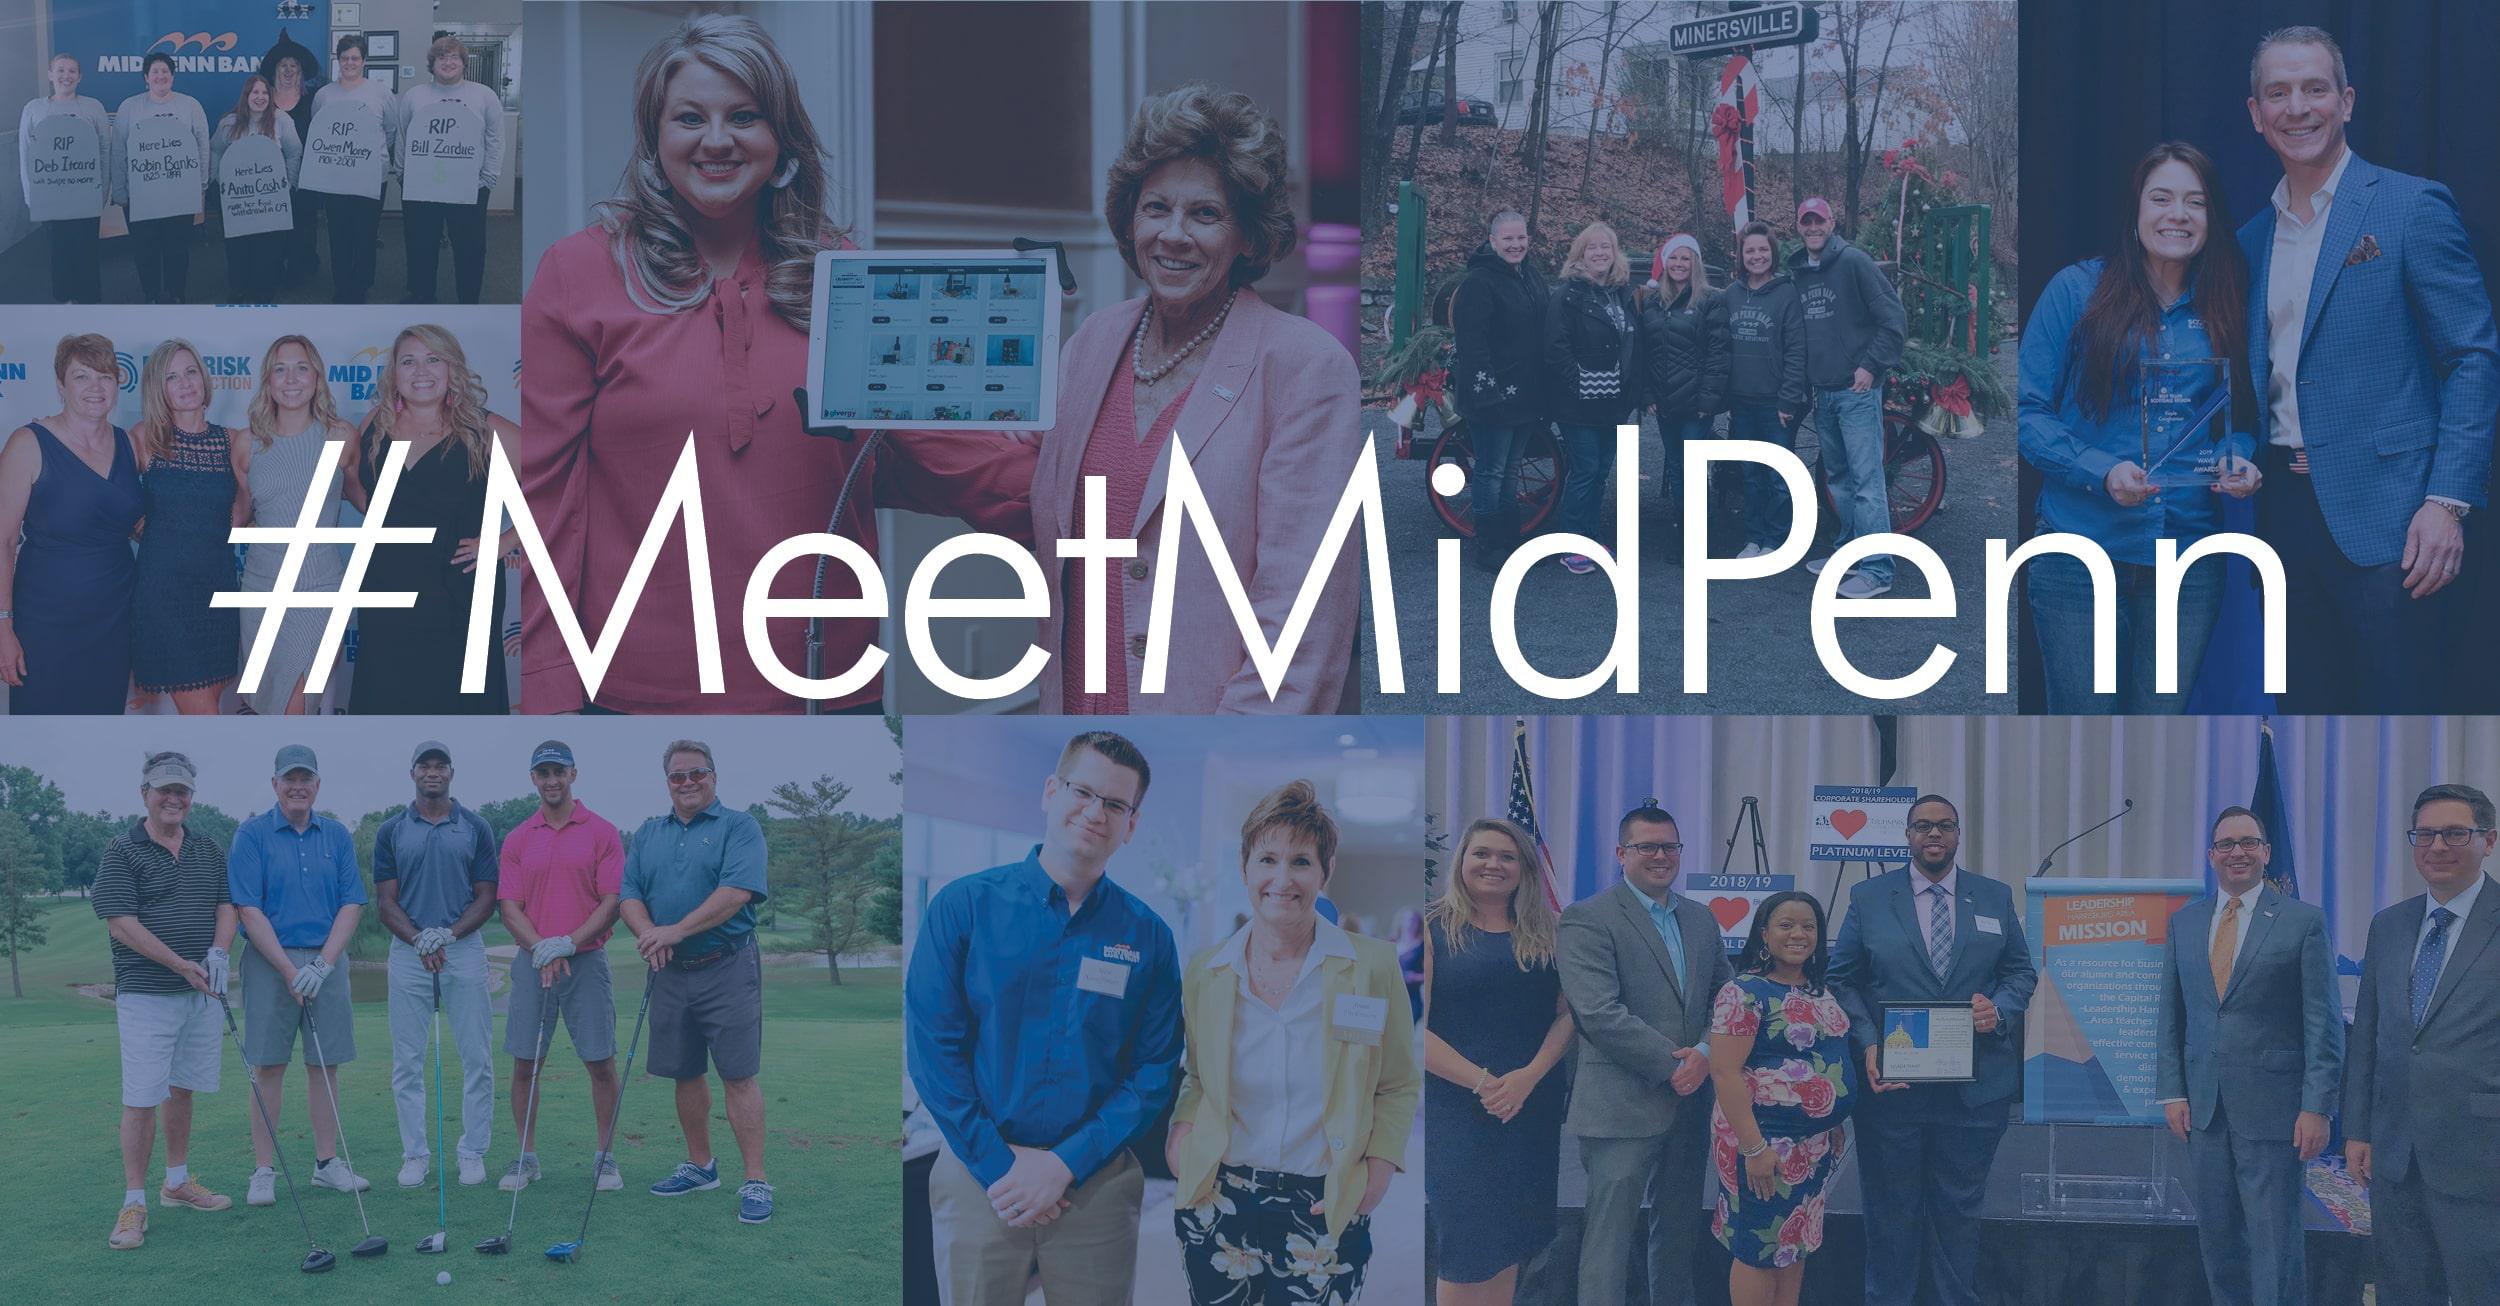 Meet Mid Penn